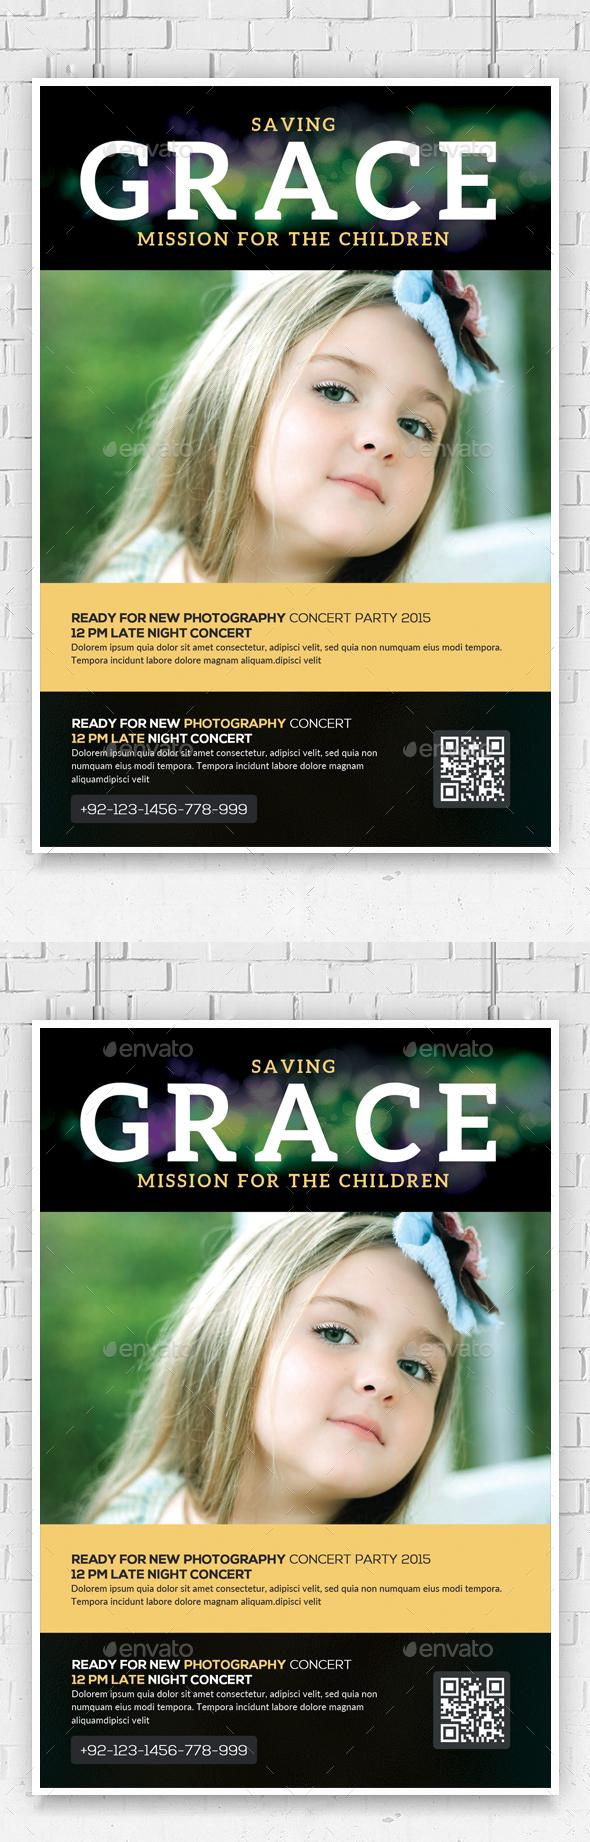 Saving Grace Church Charity Flyer - Church Flyers